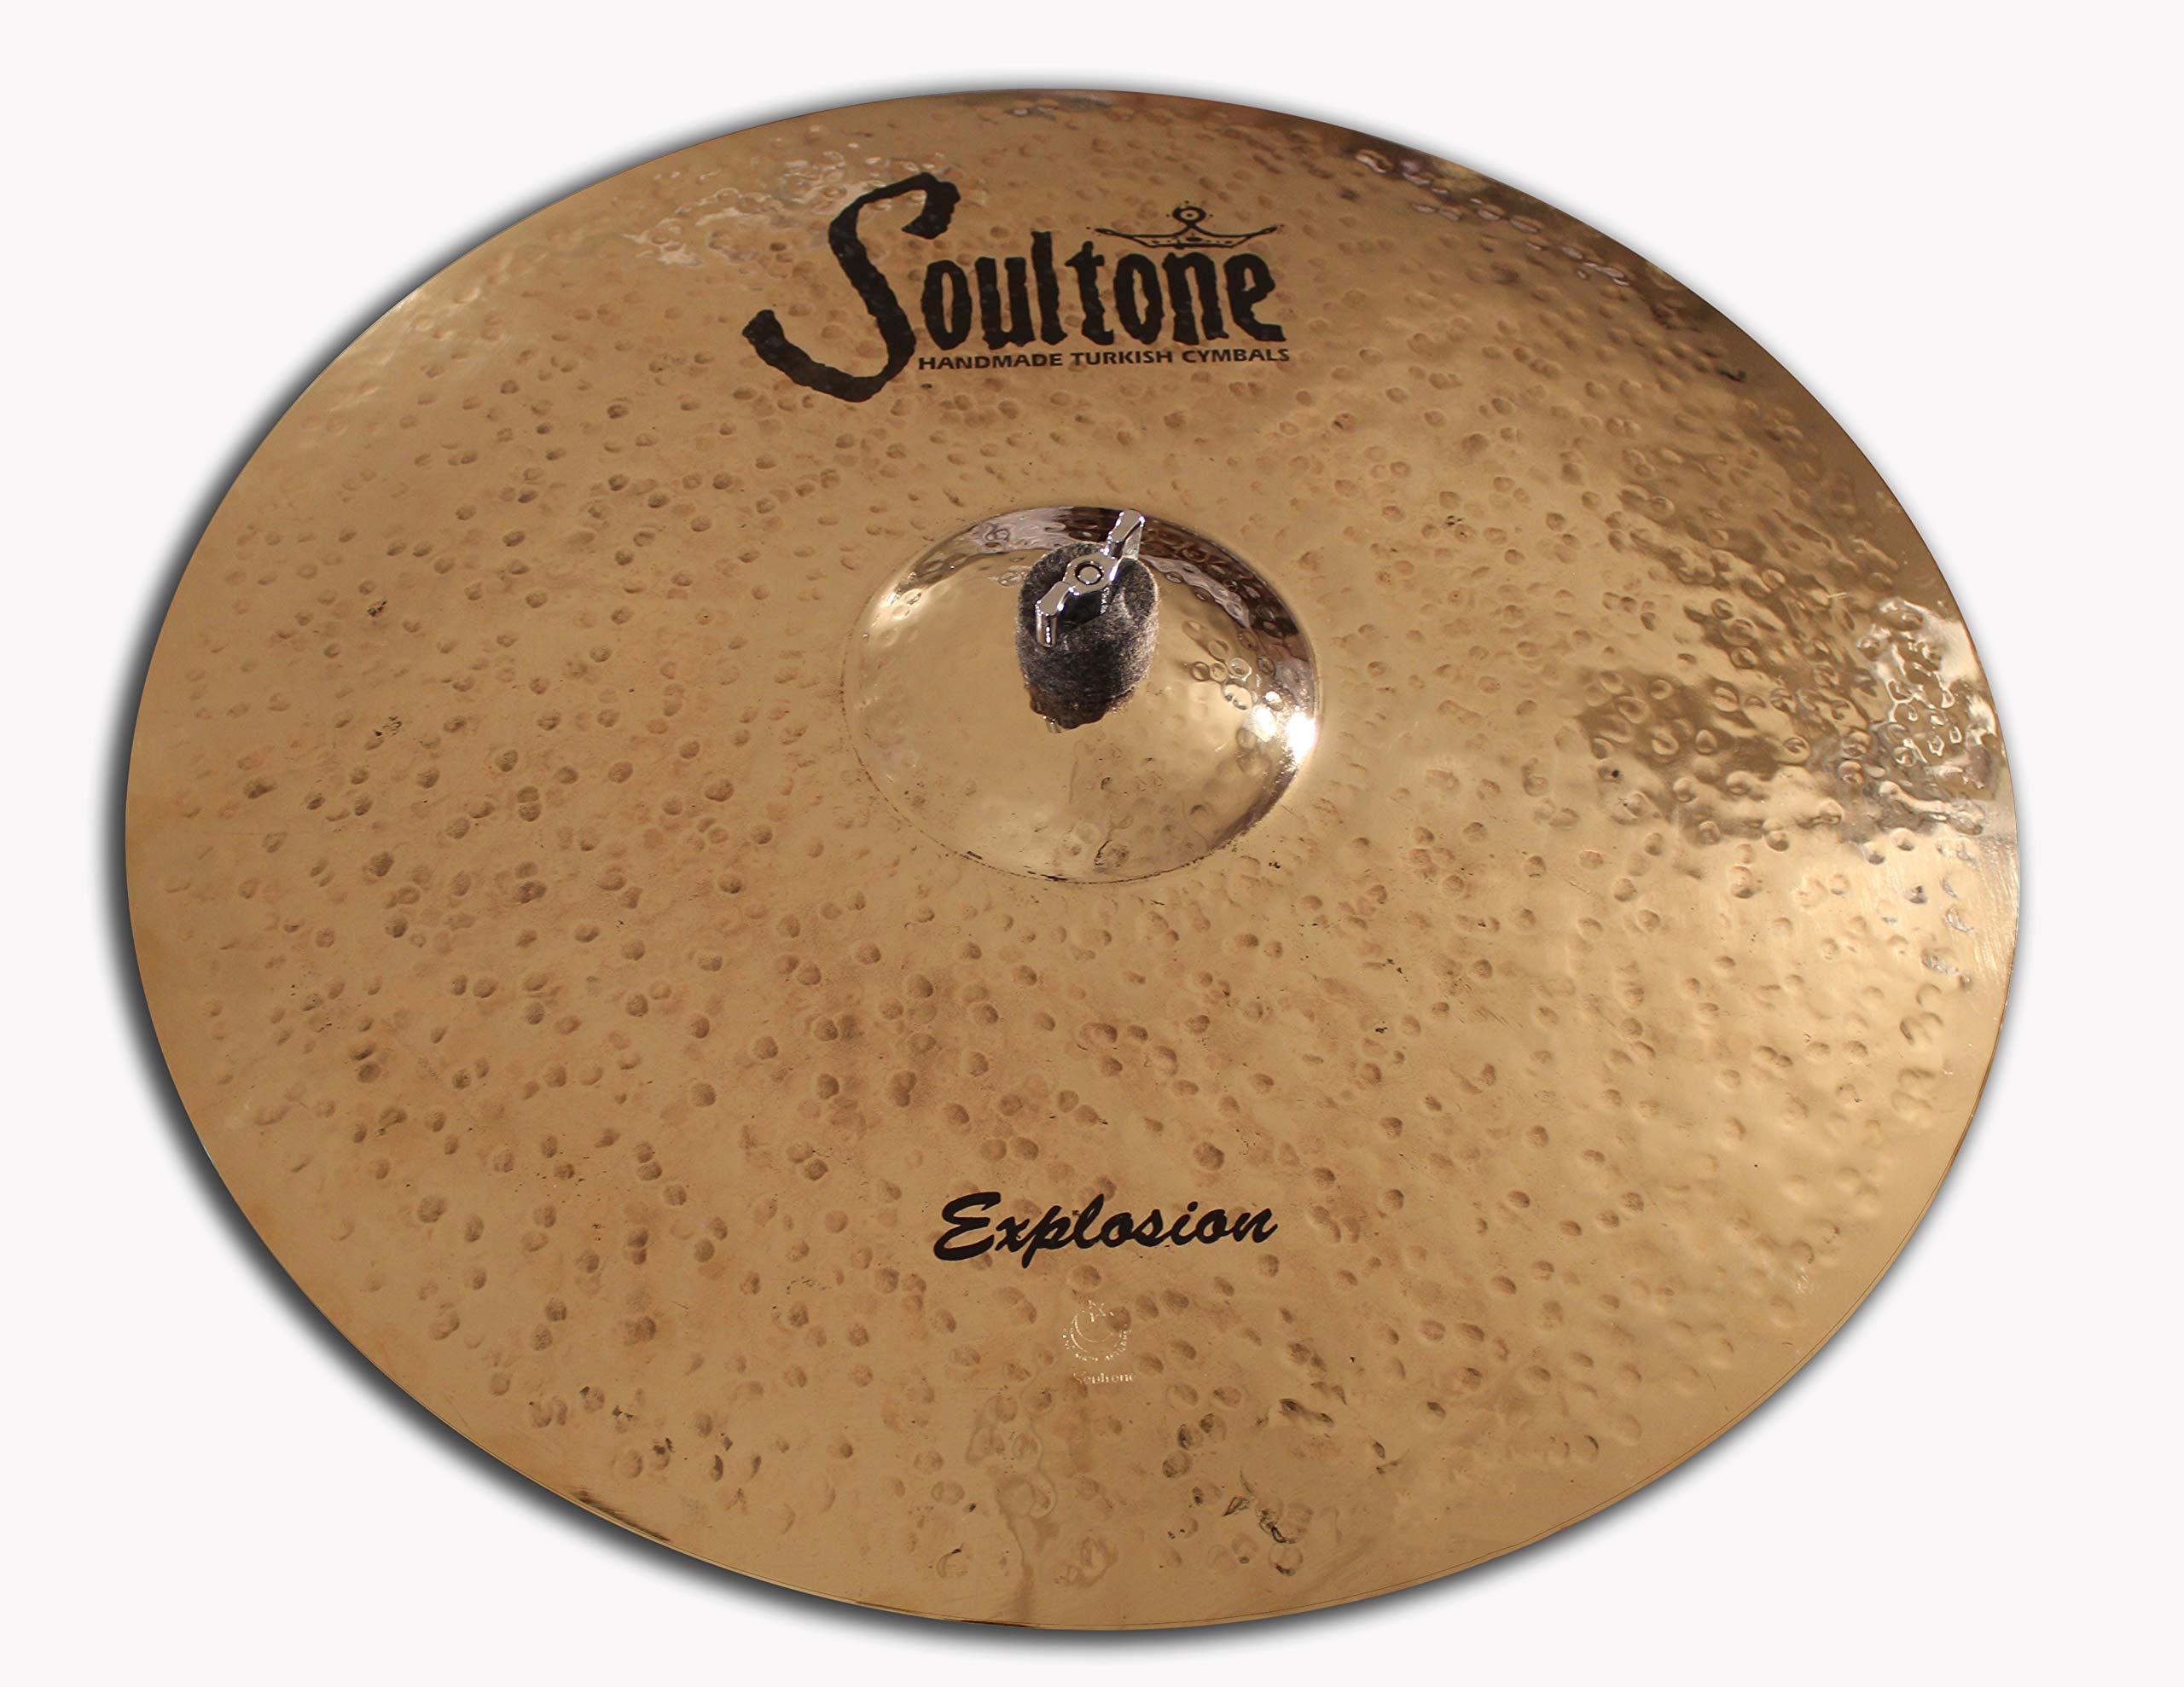 Soultone Cymbals Concert Cymbal 19 EXP-RID19